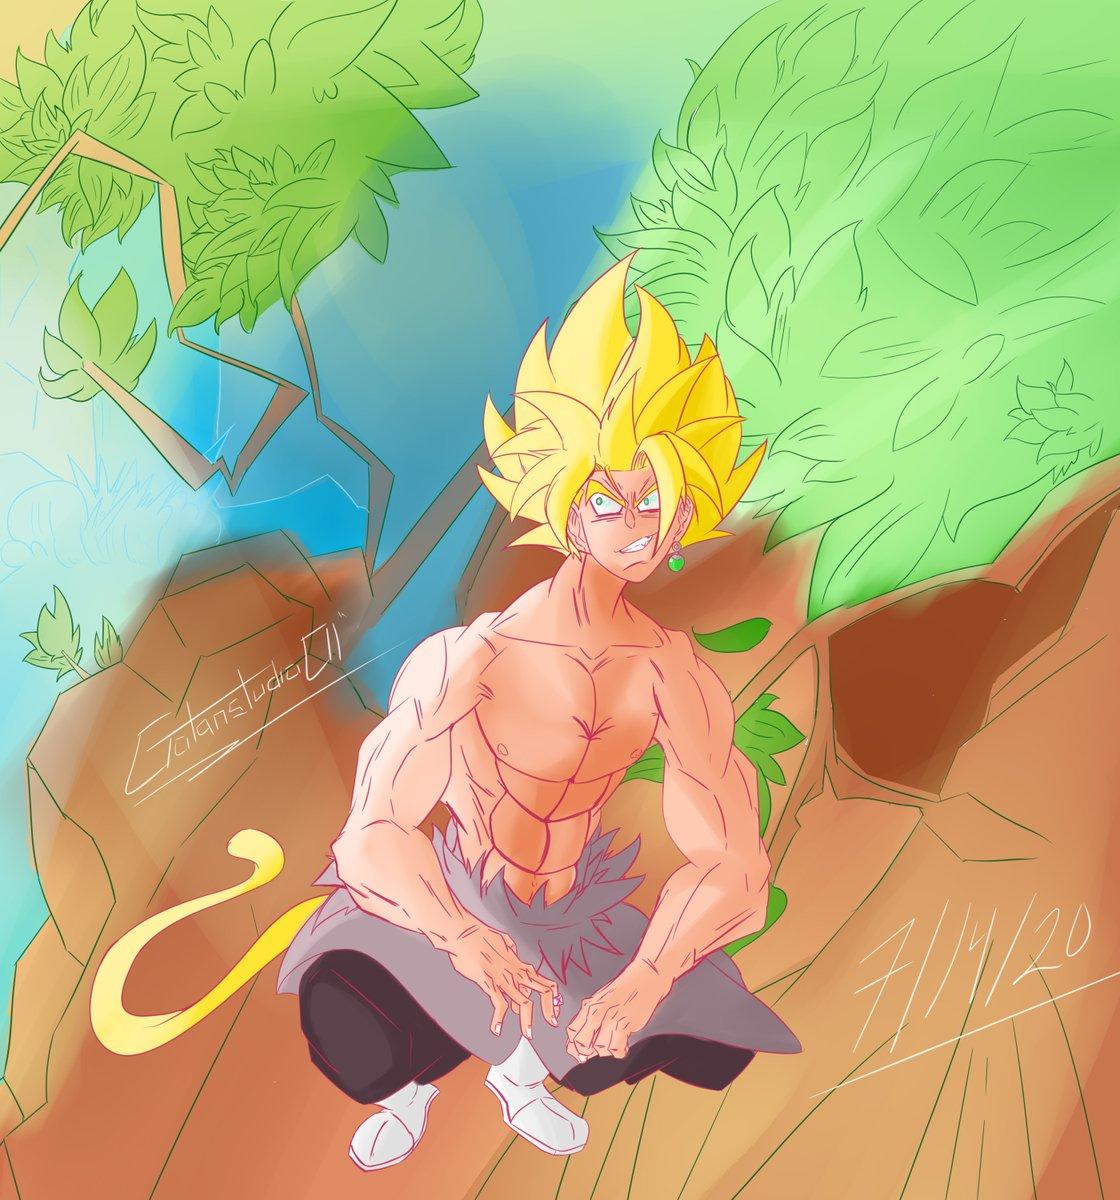 Made some fanart to the youtuber named Hyourinjutsu, Doing a picture of Goku Black from his new animation #DragonBallZ #fanart #anime #manga #illustration #painttoolsai #ArtistOnTwitter #digitalart #practicemakesperfect #anatomyart https://t.co/2Sgh4VEtCT